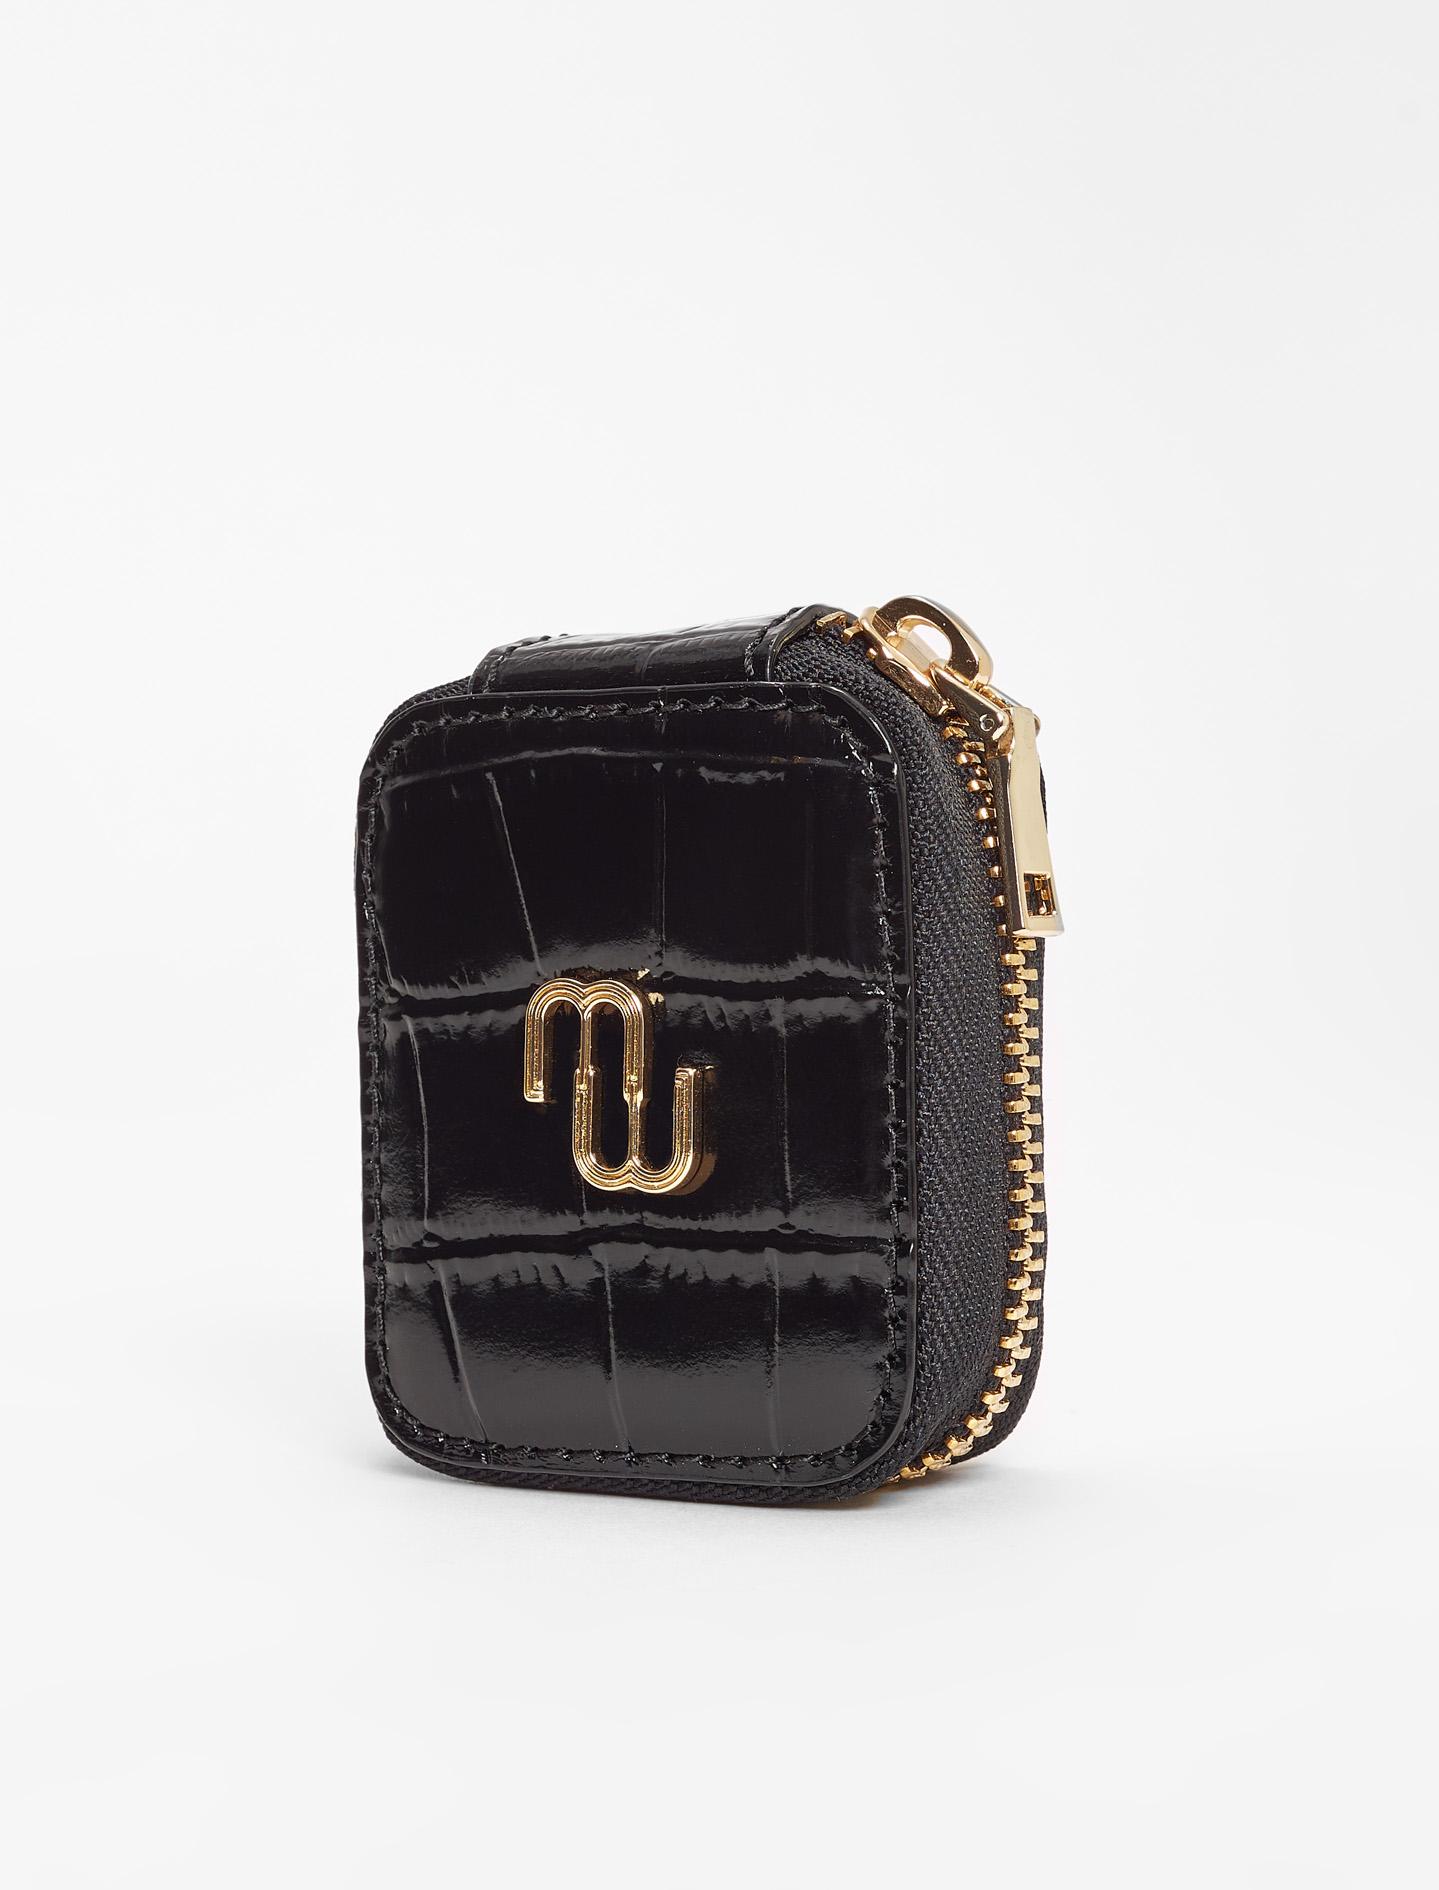 Embossed leather earphone case - Black